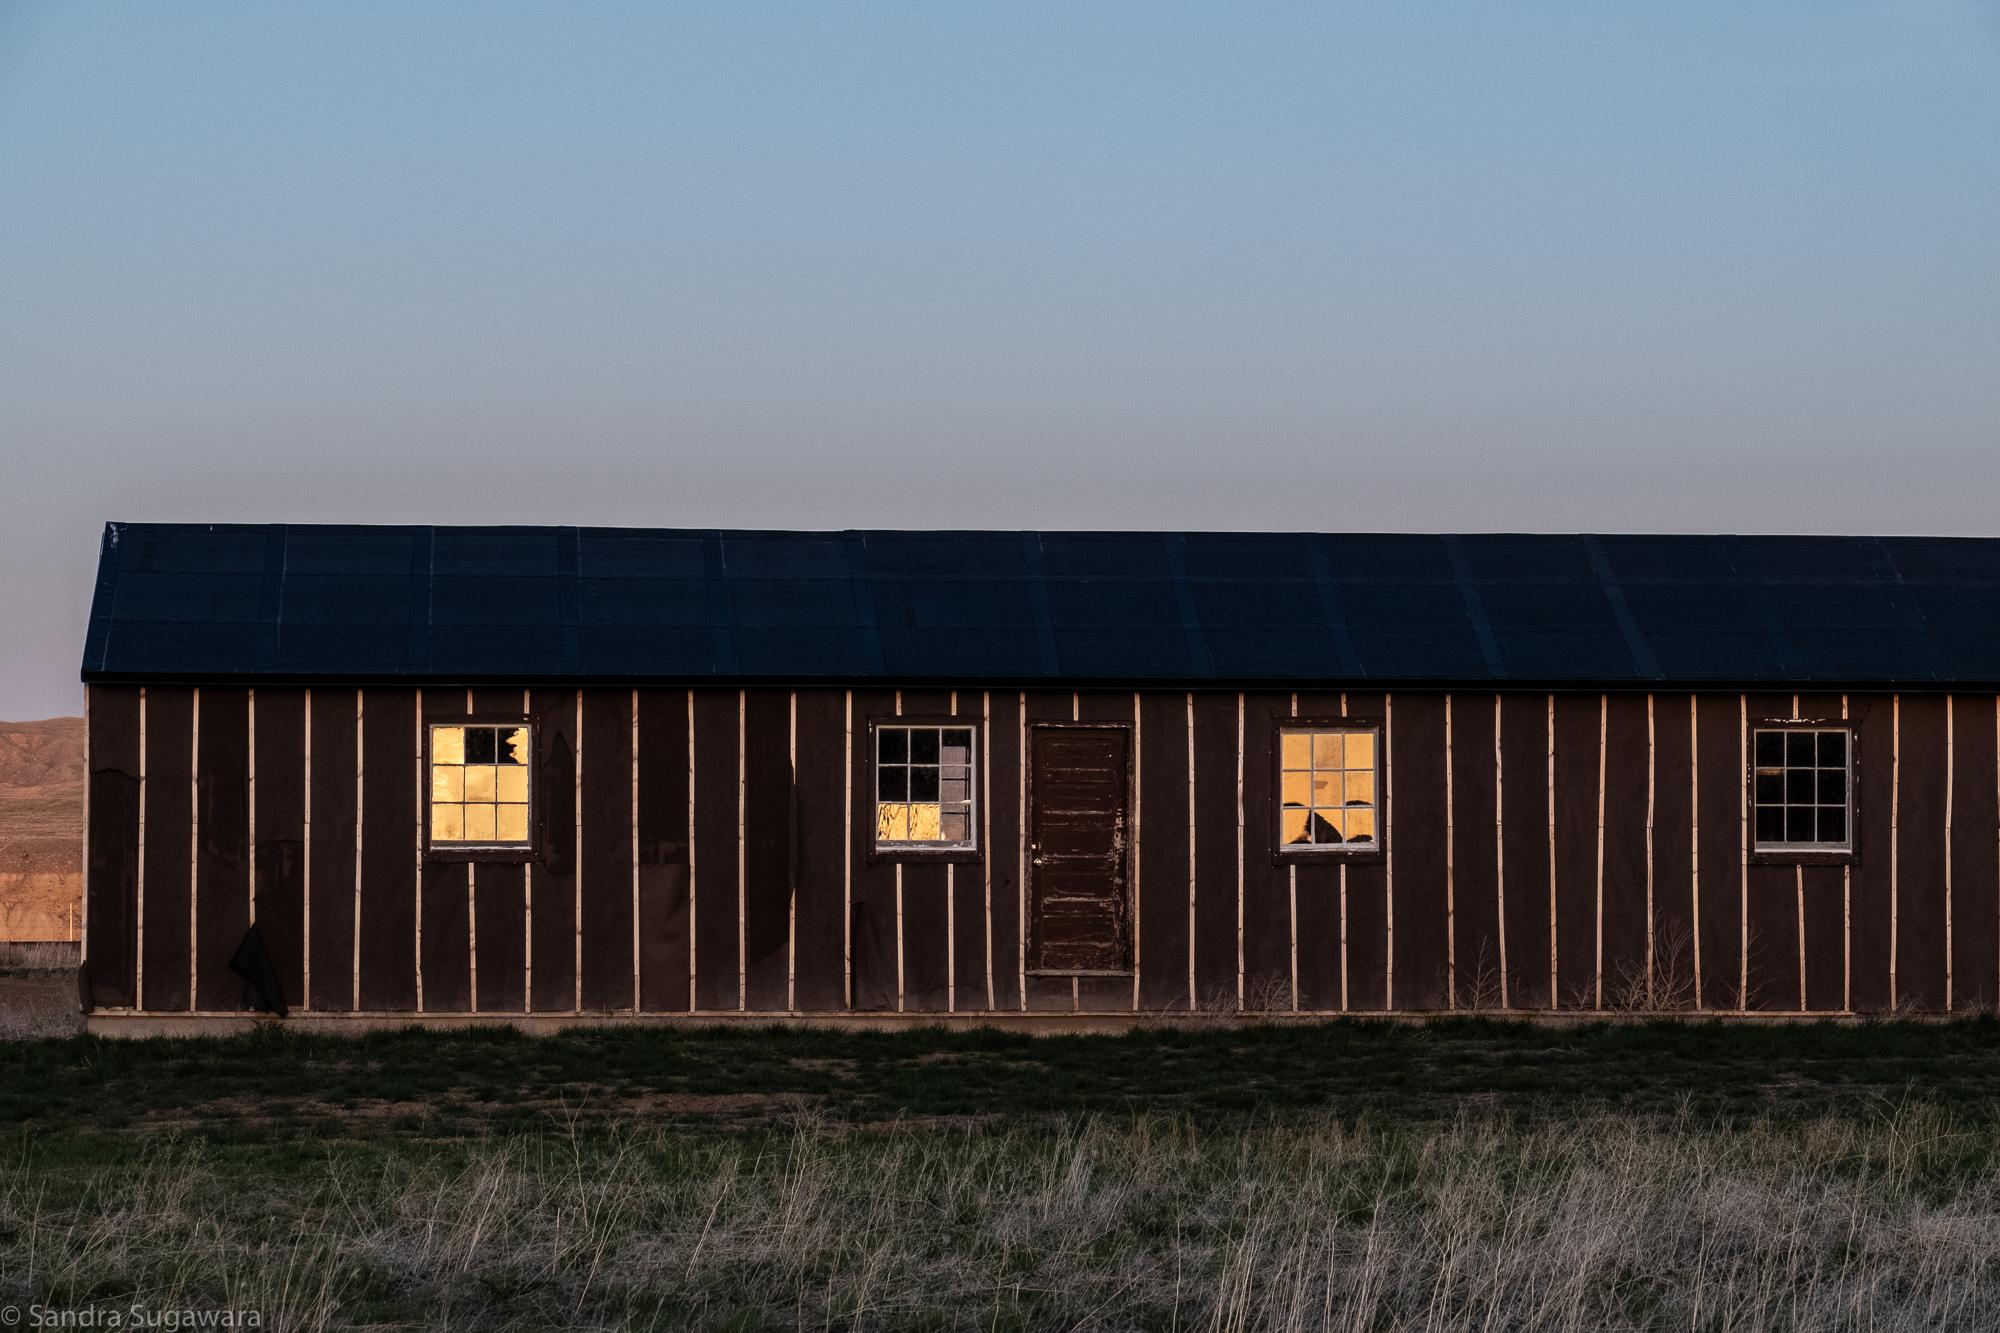 Heart Mountain Incarceration Camp